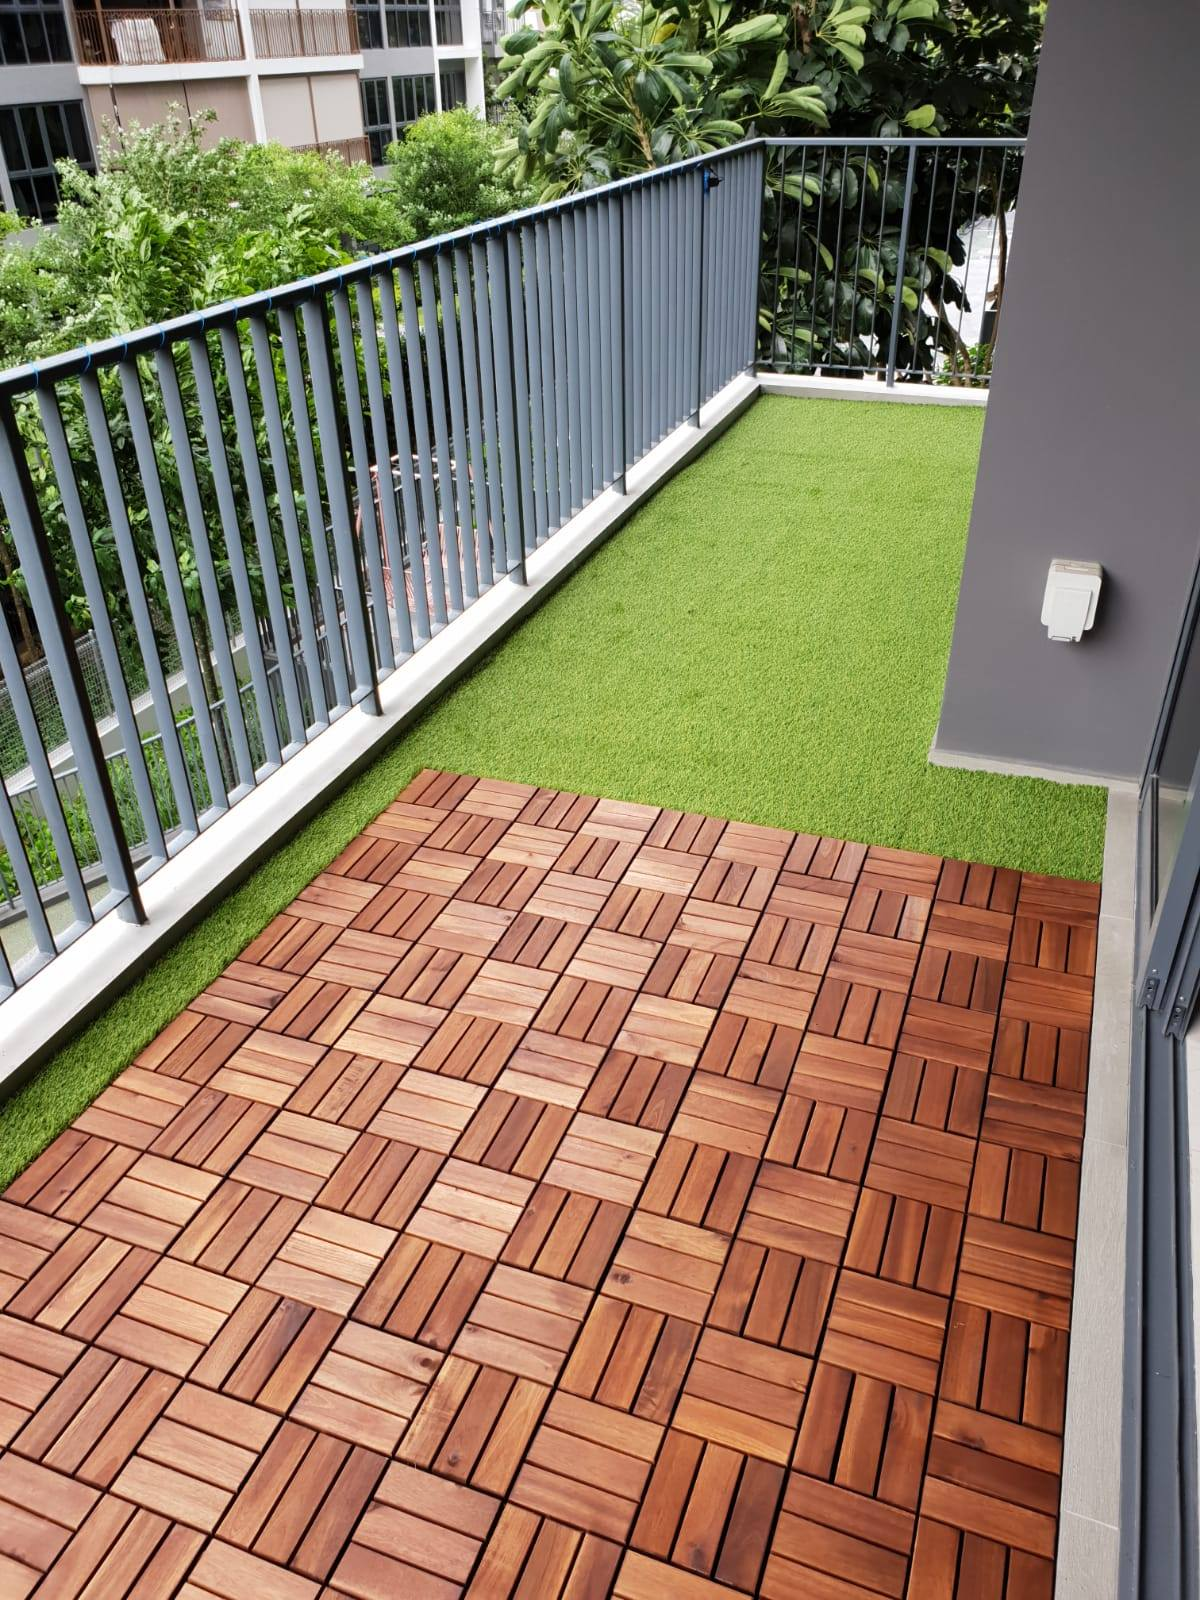 Balcony Green Space